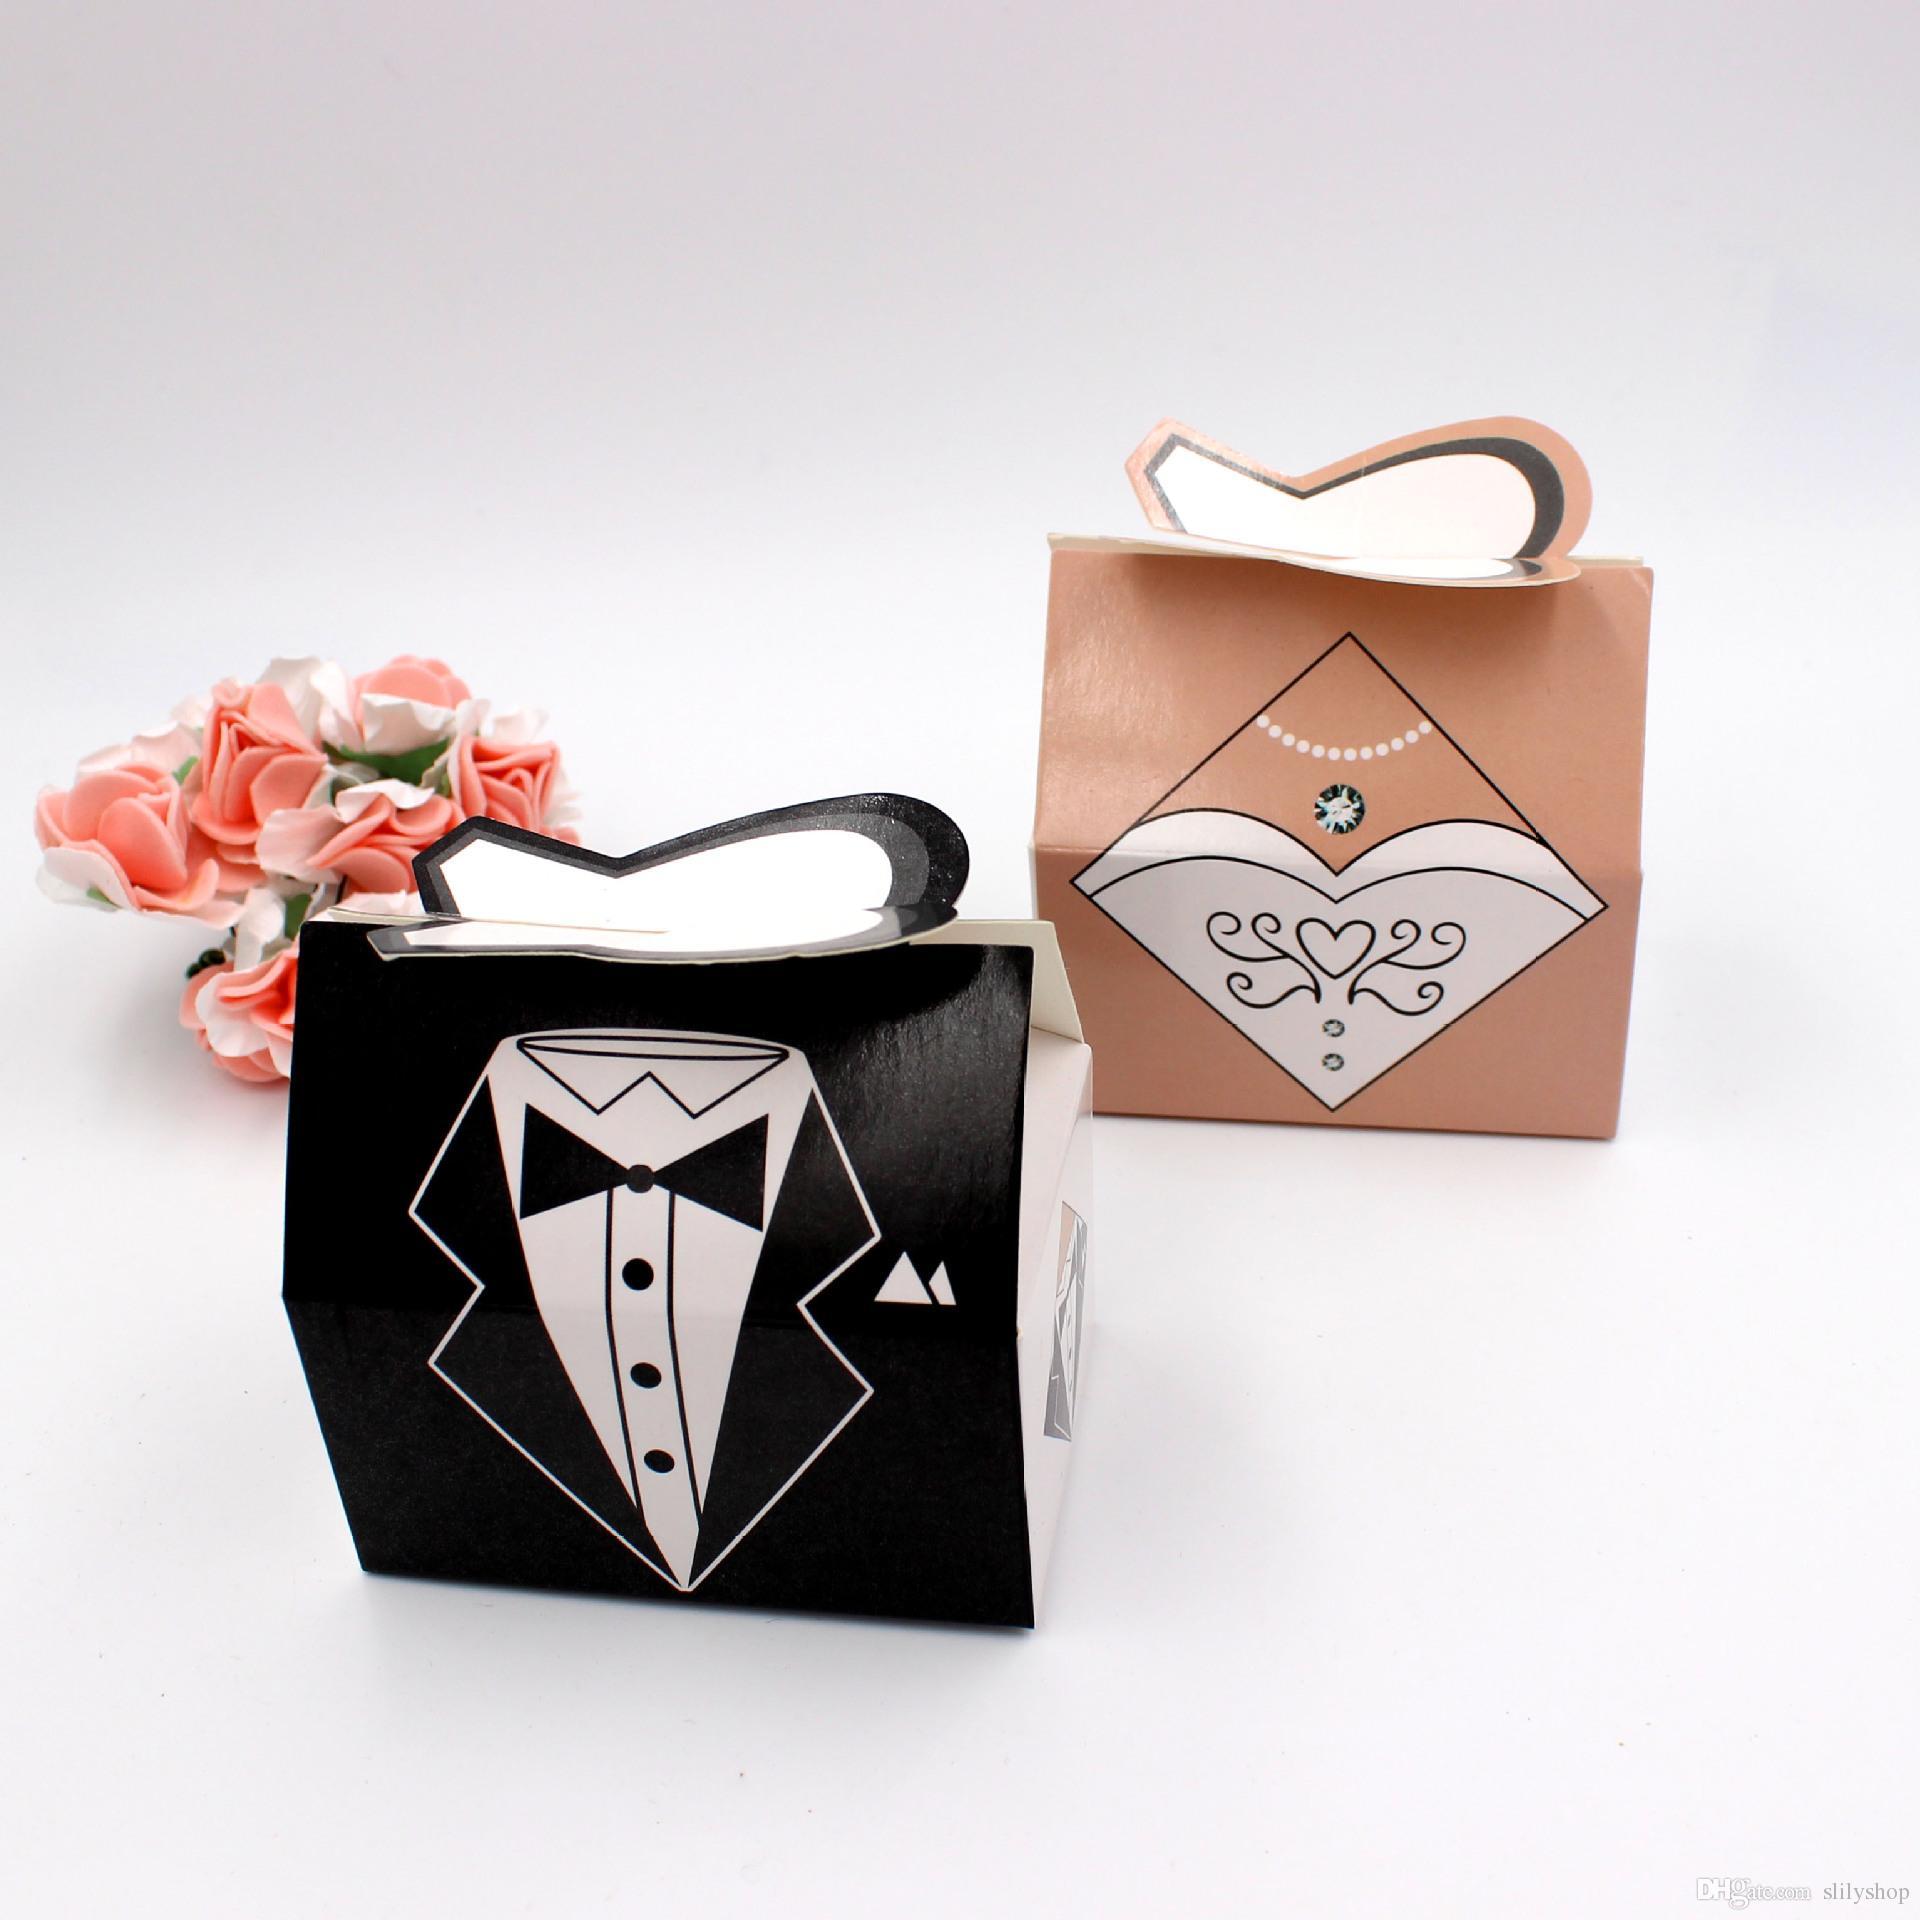 100Pair Bridal Groom Tuxedo Dress wedding candy box of cartoon folding carton gift boxes for wedding